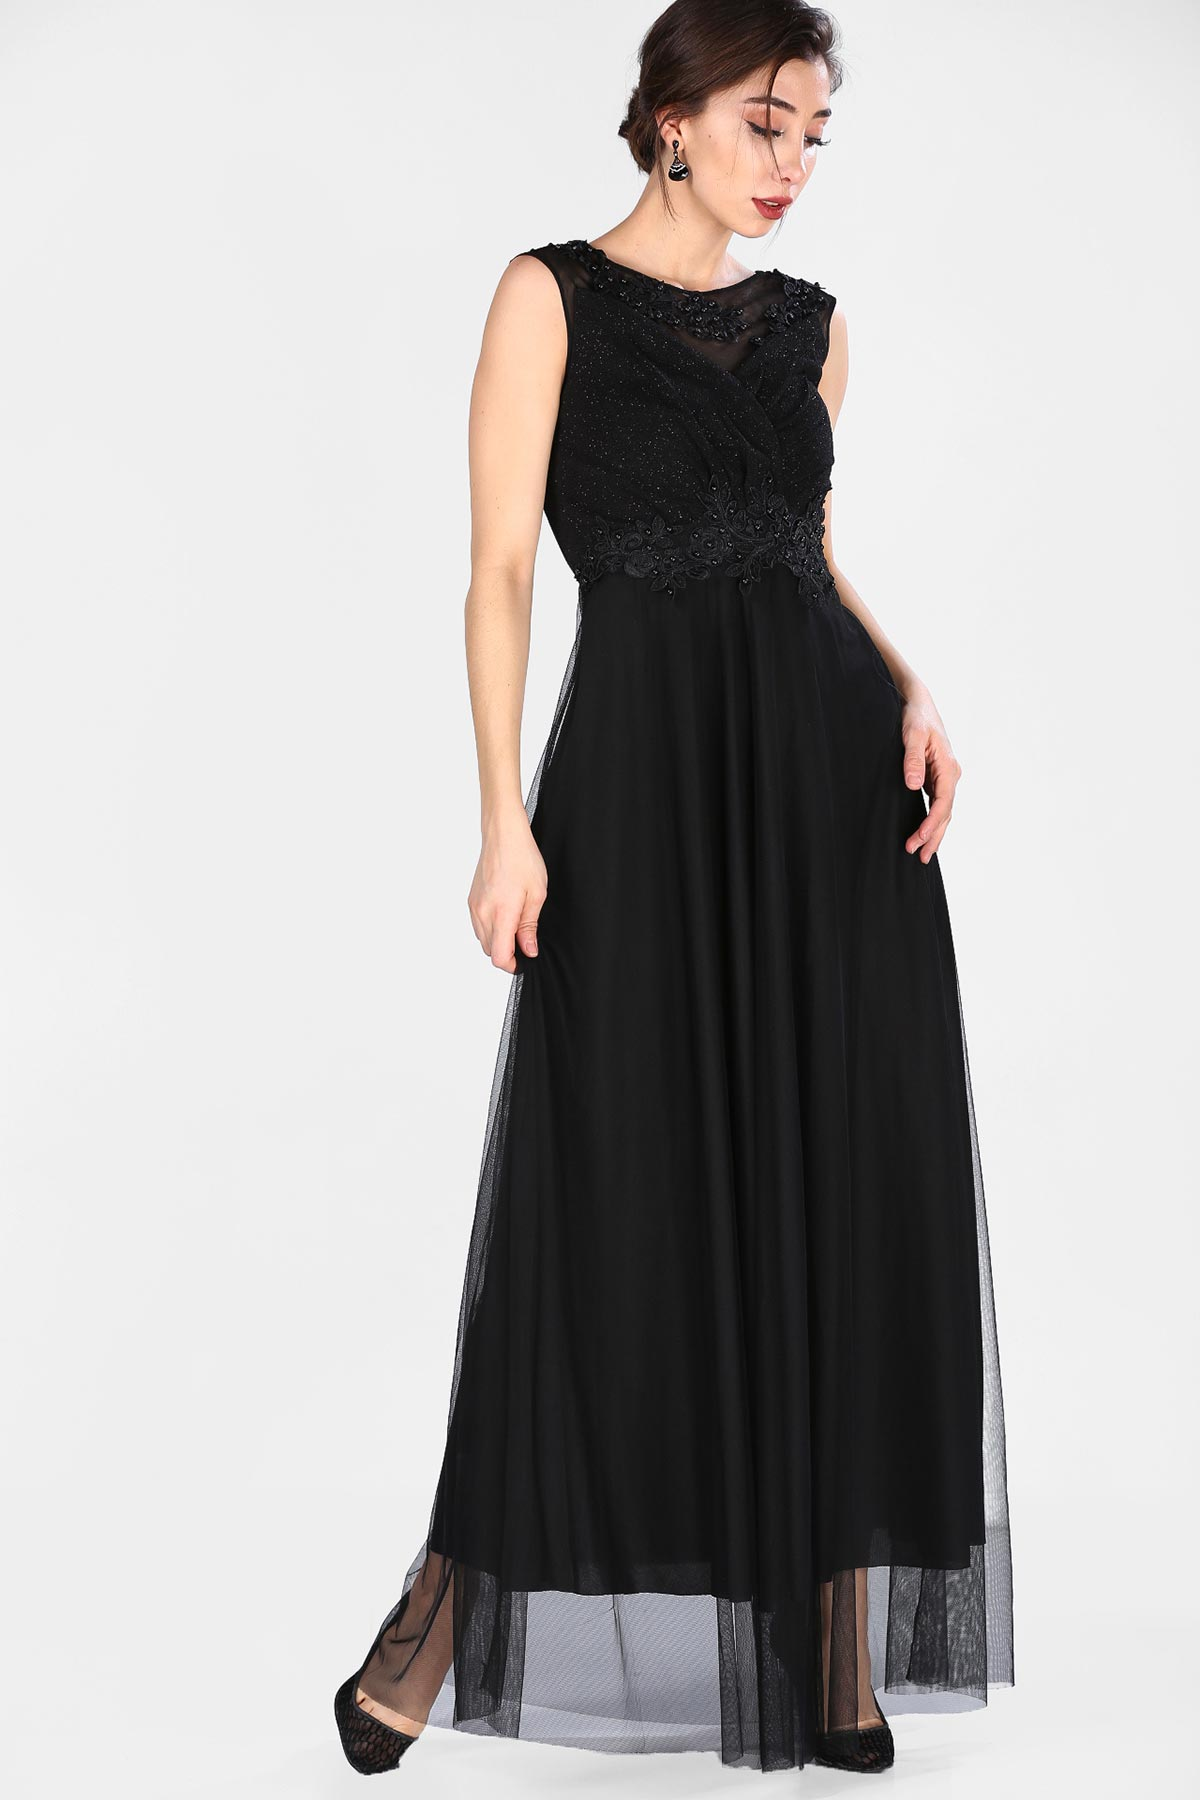 Lace Detail Black Evening Gown